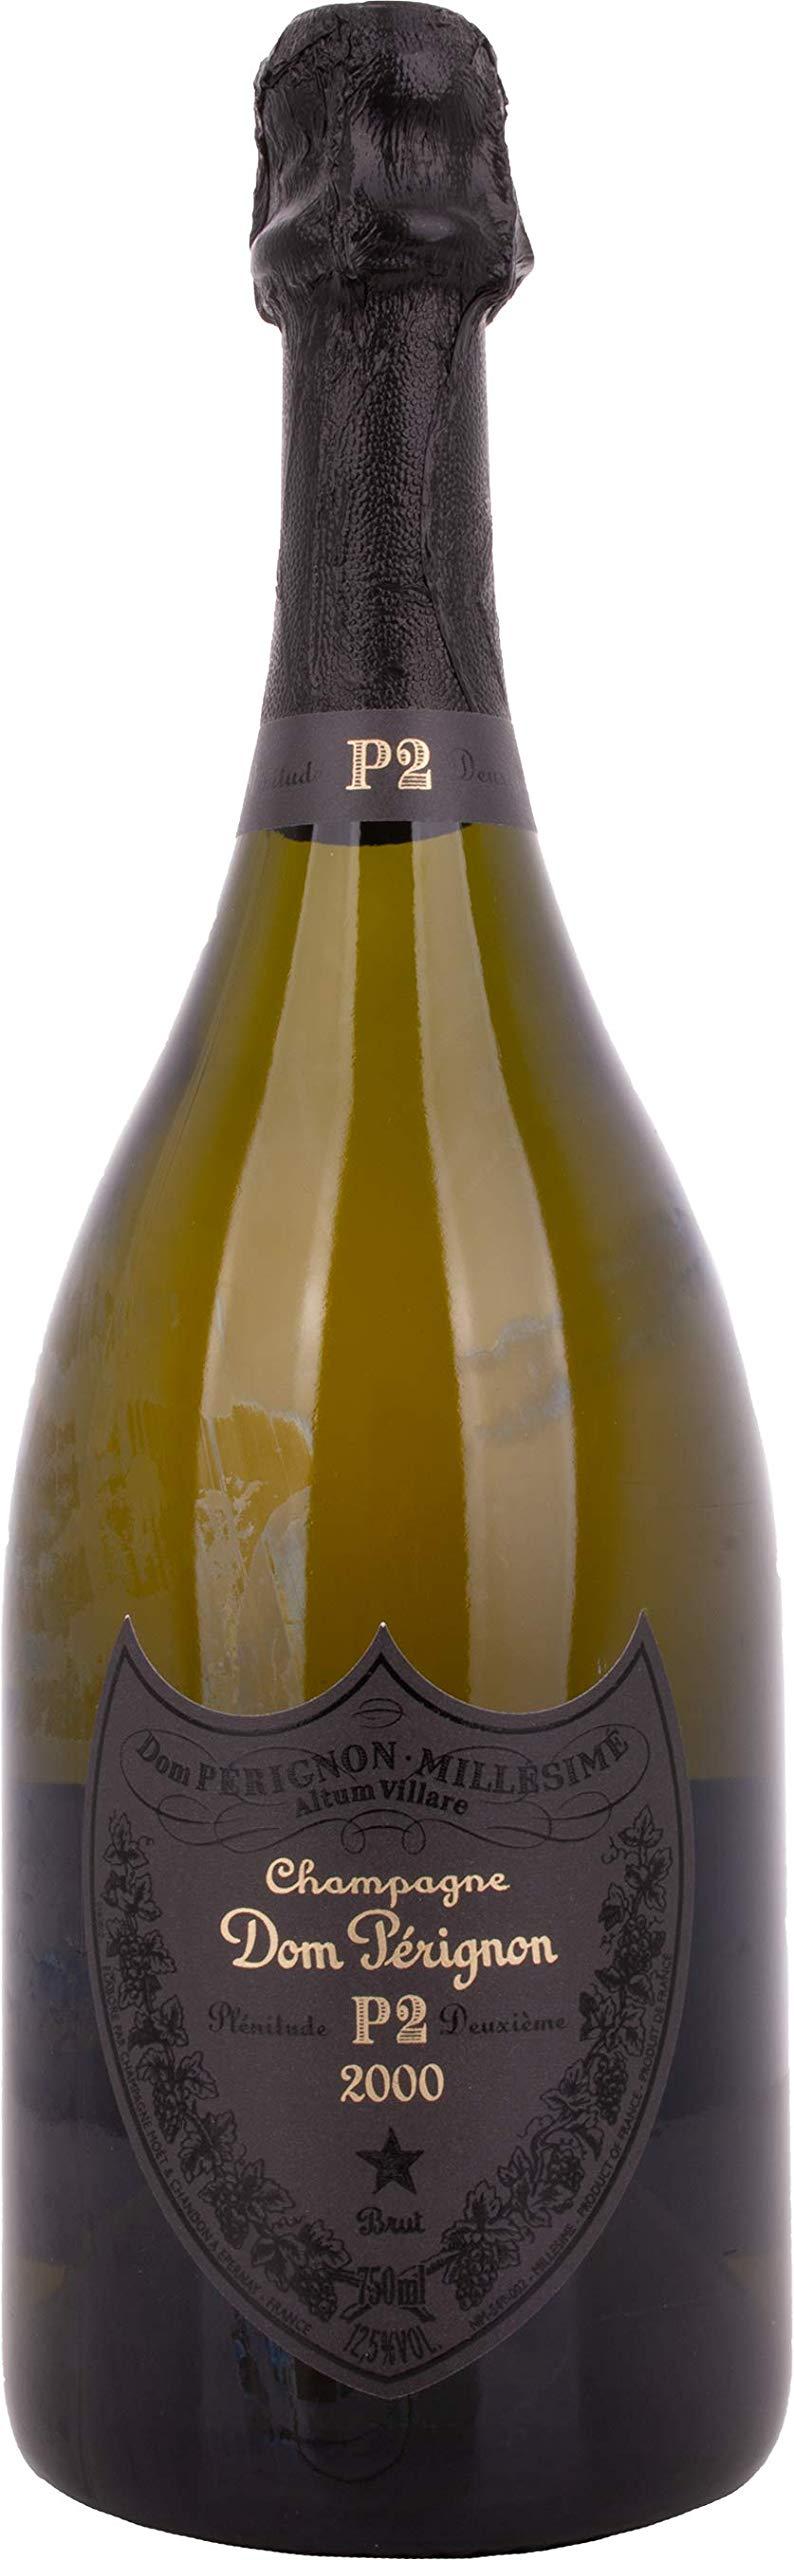 Dom-Prignon-Champagne-P2-Vintage-2000-Champagner-1-x-075-l